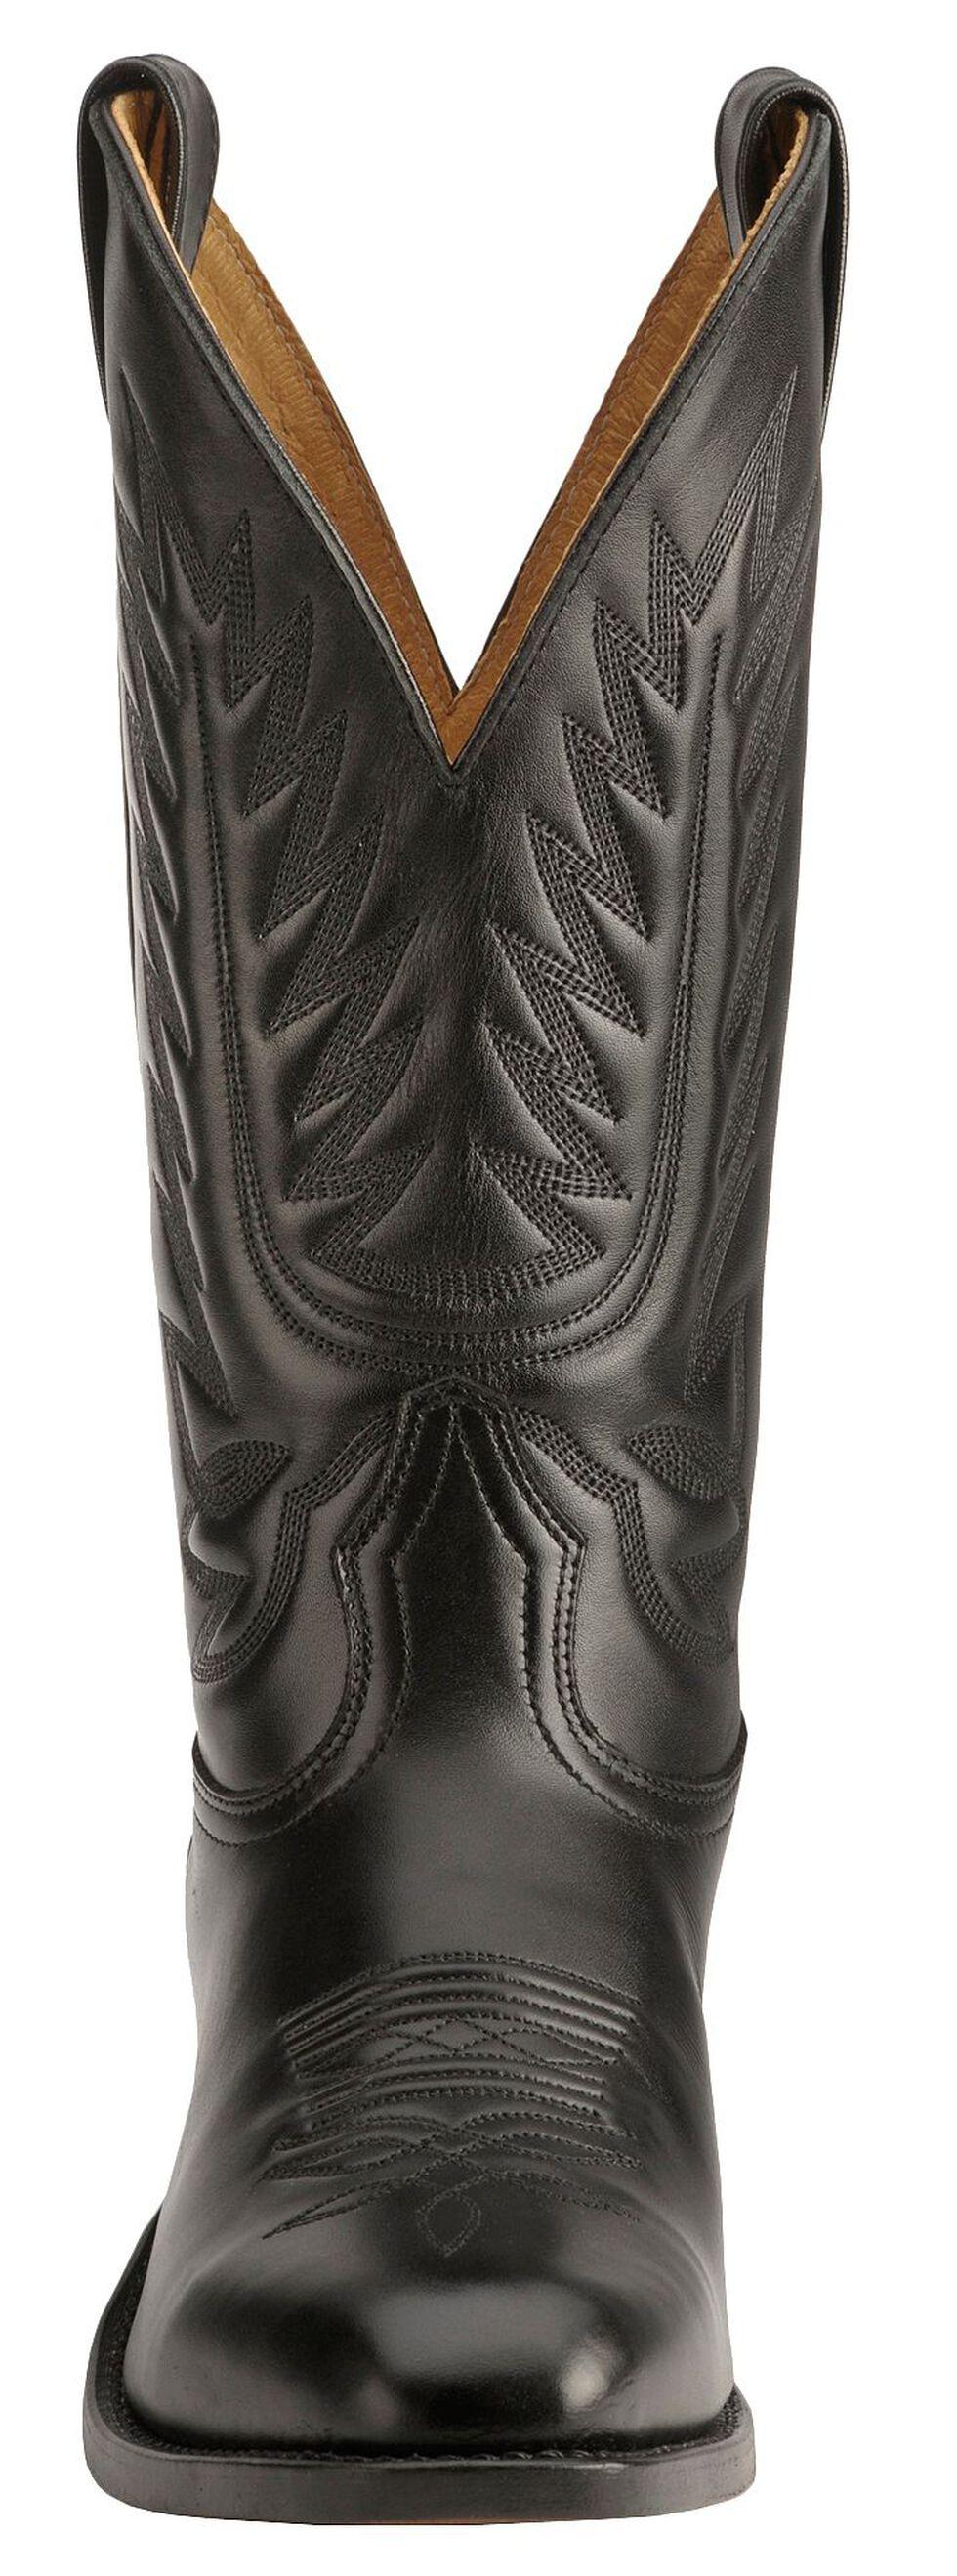 Boulet Dress Cowboy Boots - Round Toe, Black, hi-res